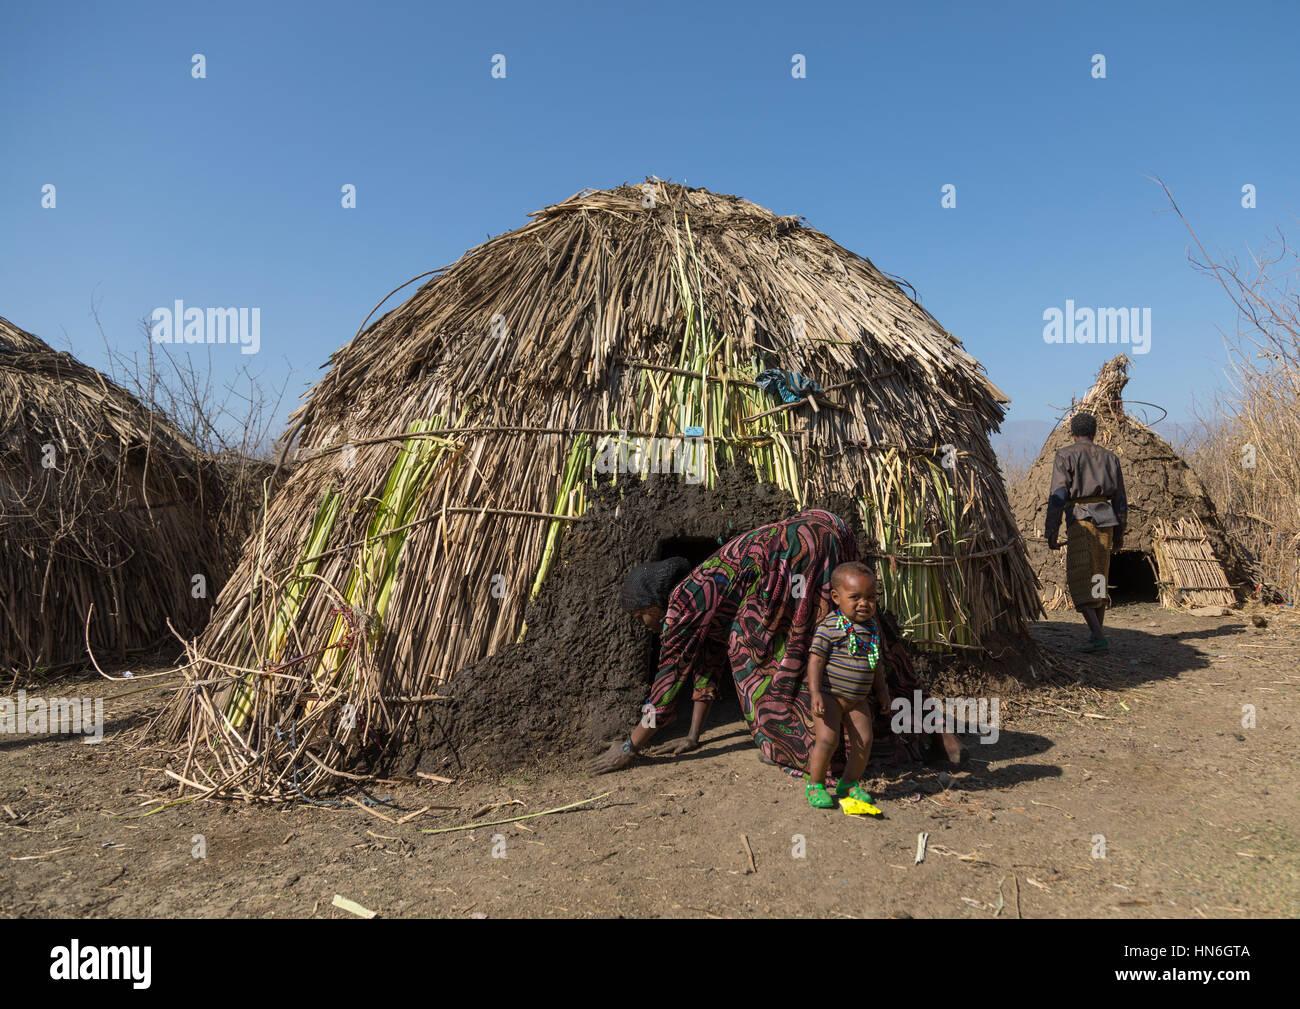 Oromo Village Hut Stock Photos & Oromo Village Hut Stock